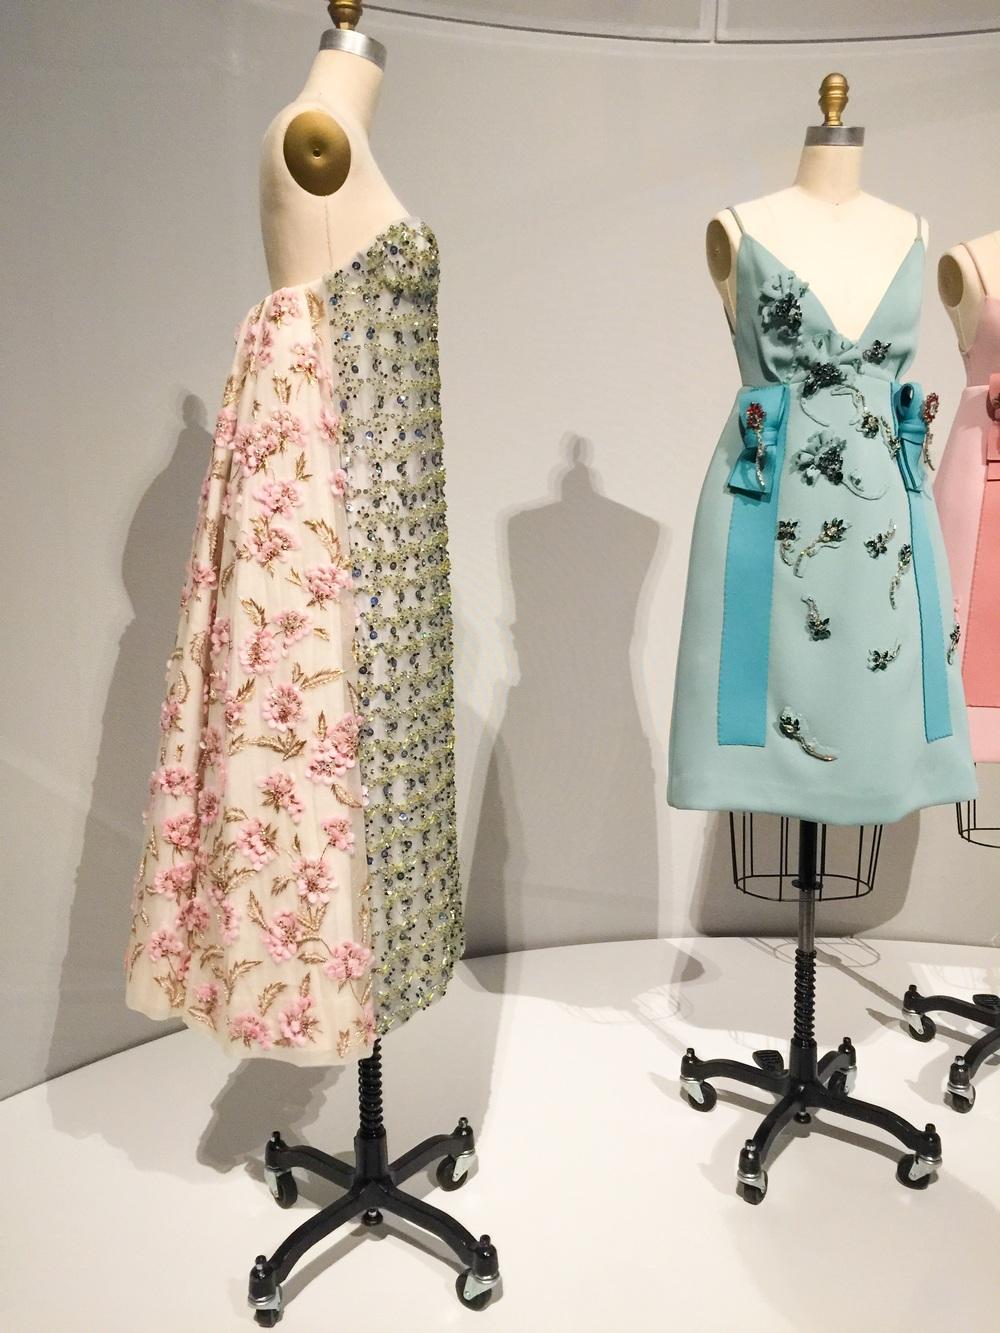 Raf Simons for Christian Dior, Autumn Winter 2012-13 Haute Couture; Prada Autumn Winter 2015 Ready to Wear